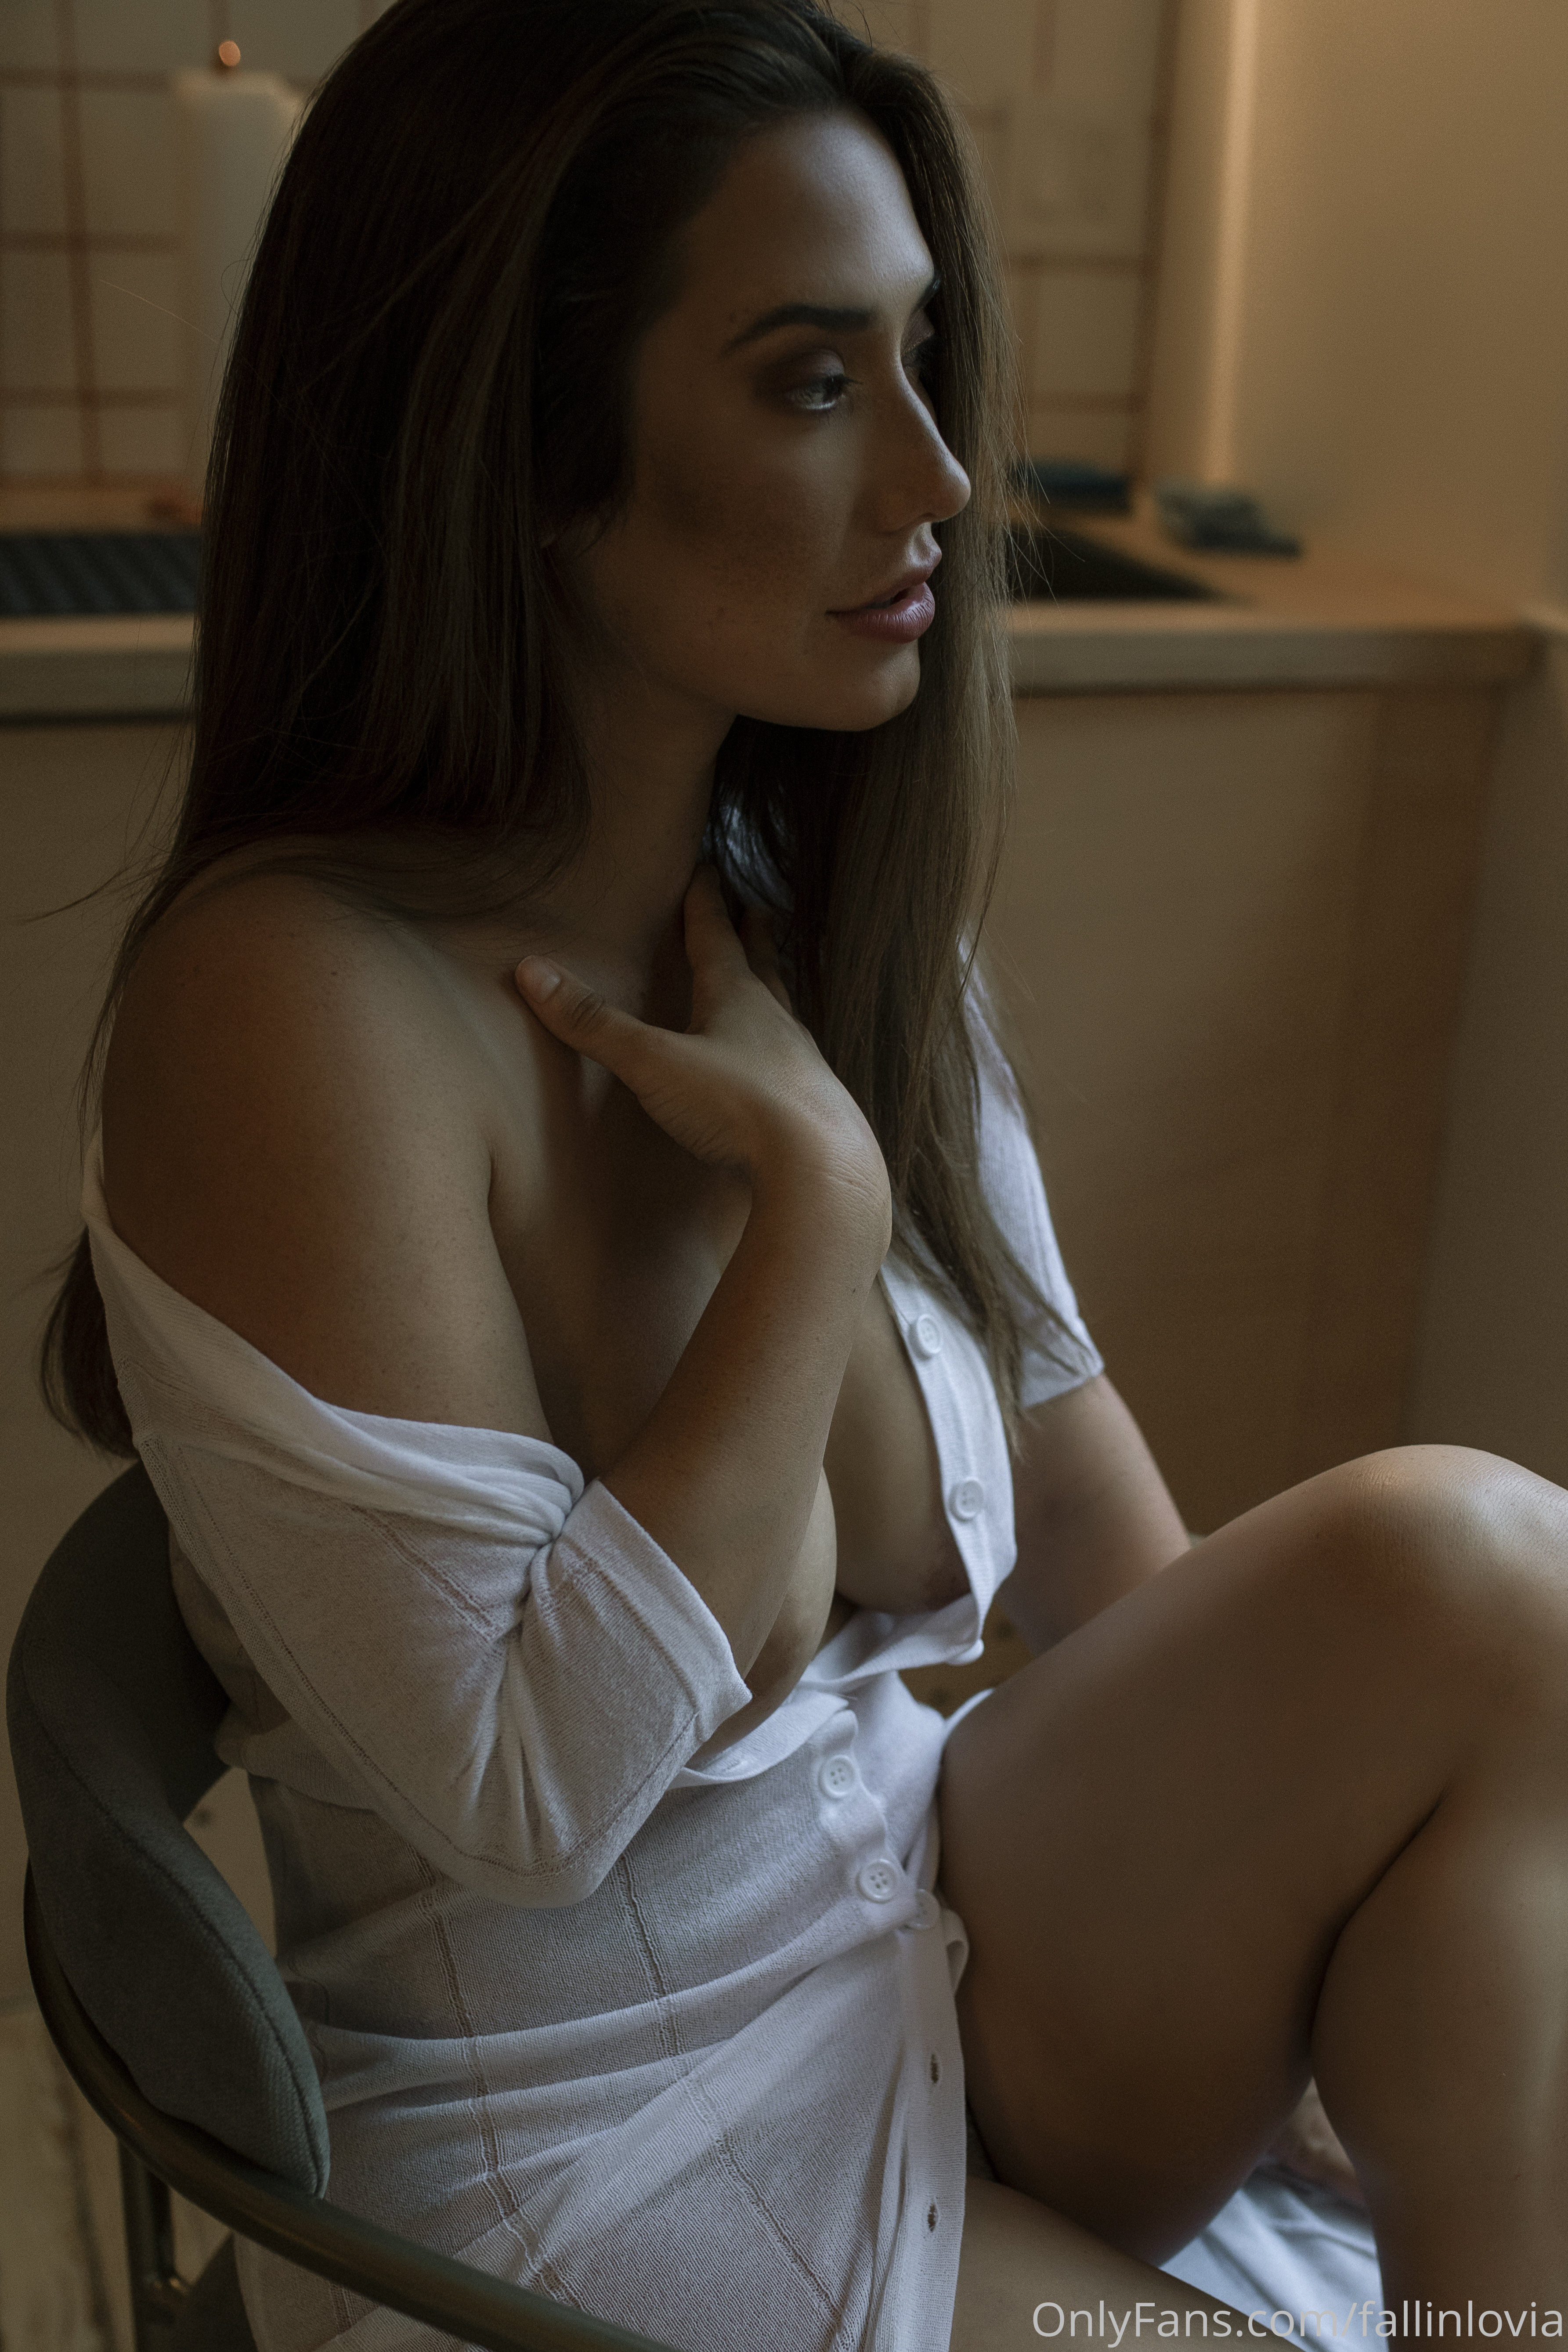 Eva Lovia, Fallinlovia, Onlyfans 0108